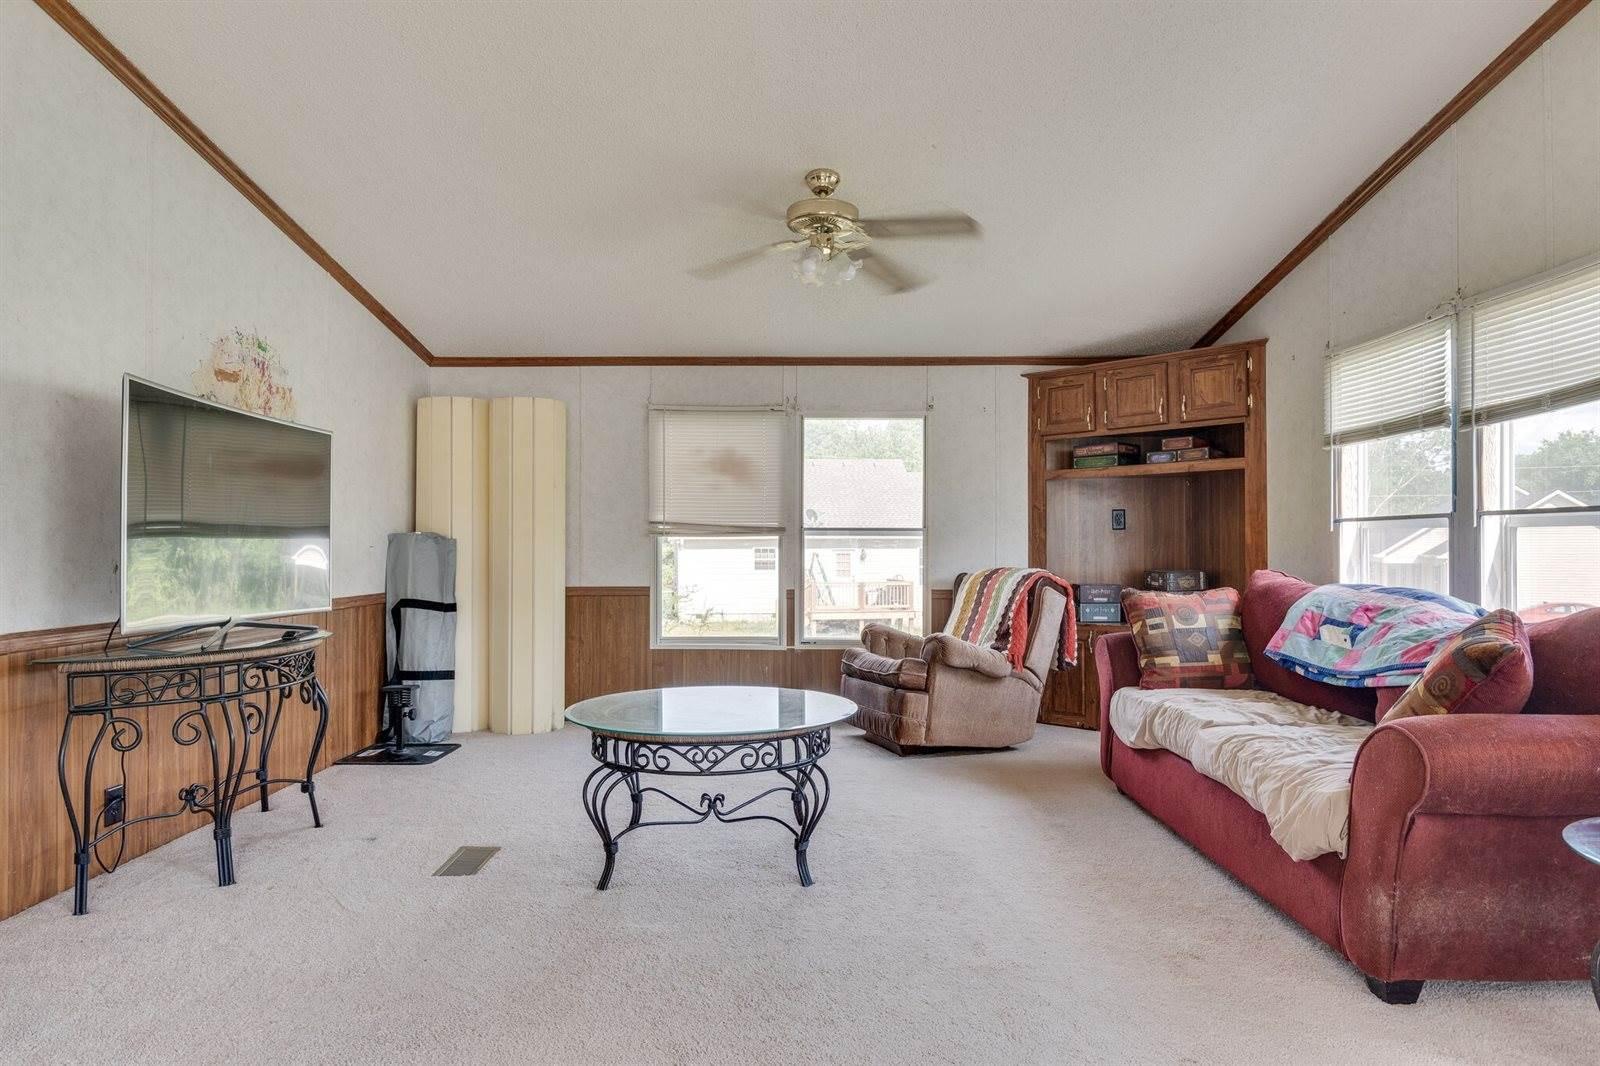 243 Boyette Ave, Lewisburg, TN 37091